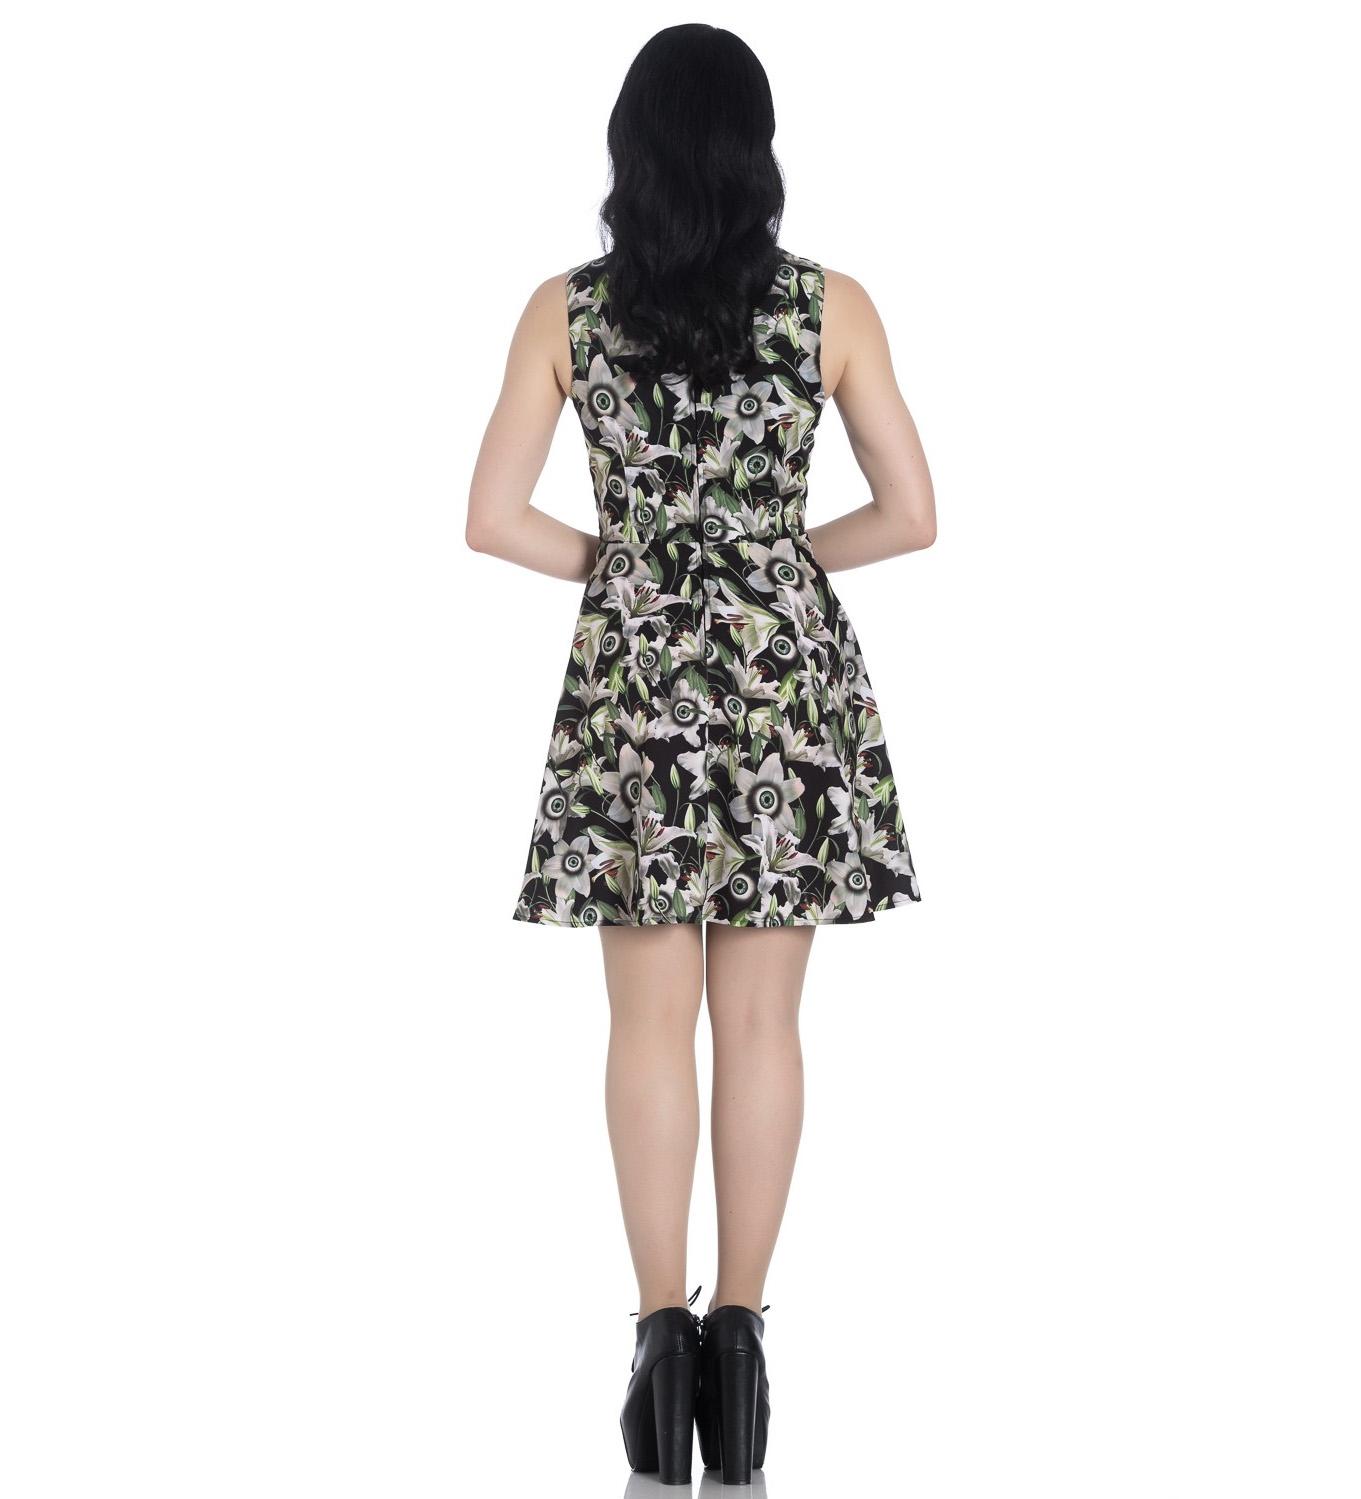 Hell-Bunny-Black-Lace-Up-Goth-Punk-Mini-Dress-PEEPERS-Eyeballs-Flowers-All-Sizes thumbnail 49